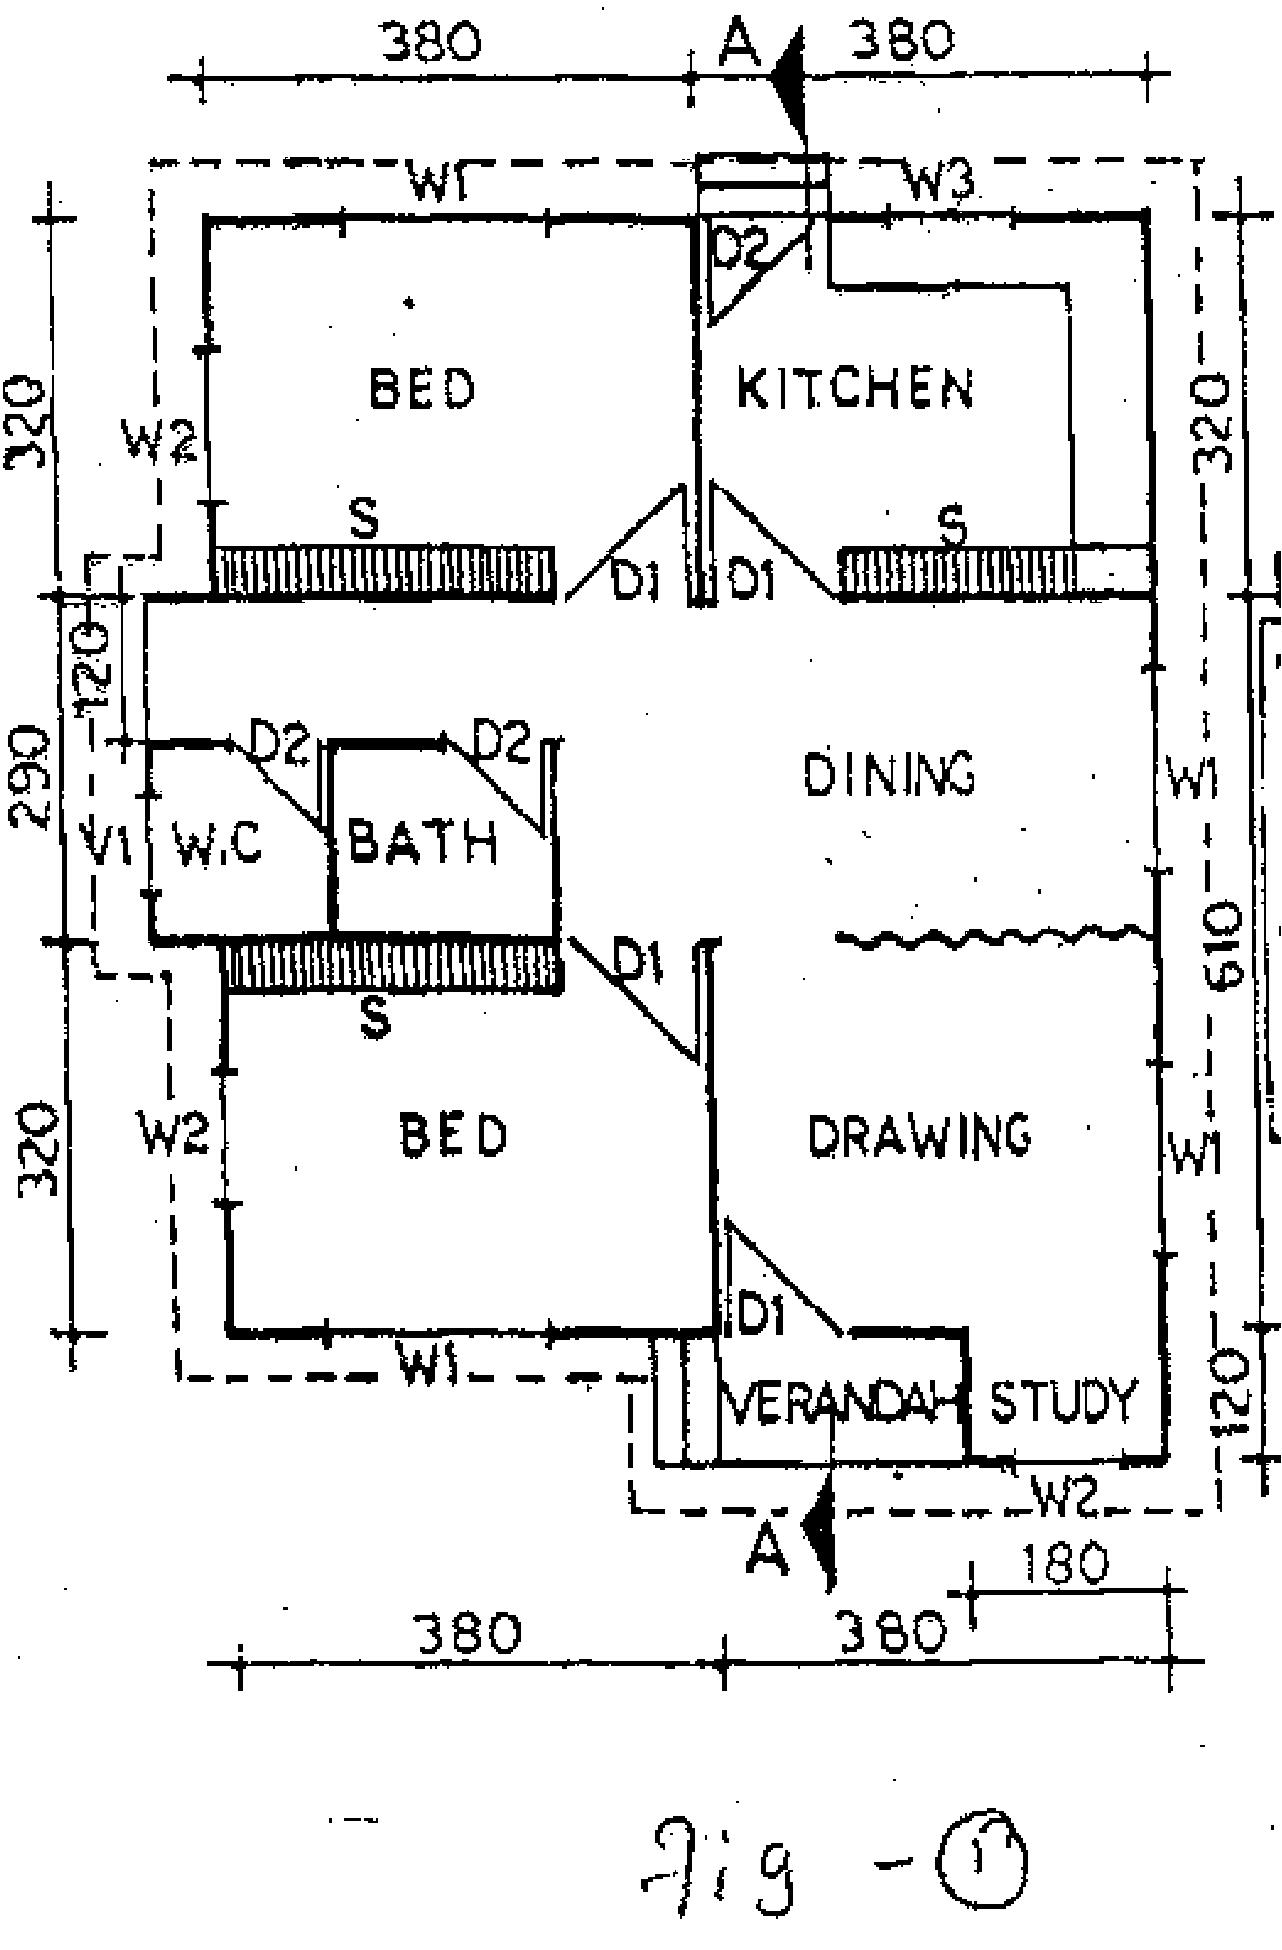 Bharathiar University 2007 5th Sem Be Civil Engineering I Figno1 Simple Wiring Diagram For A Residential Building Q No